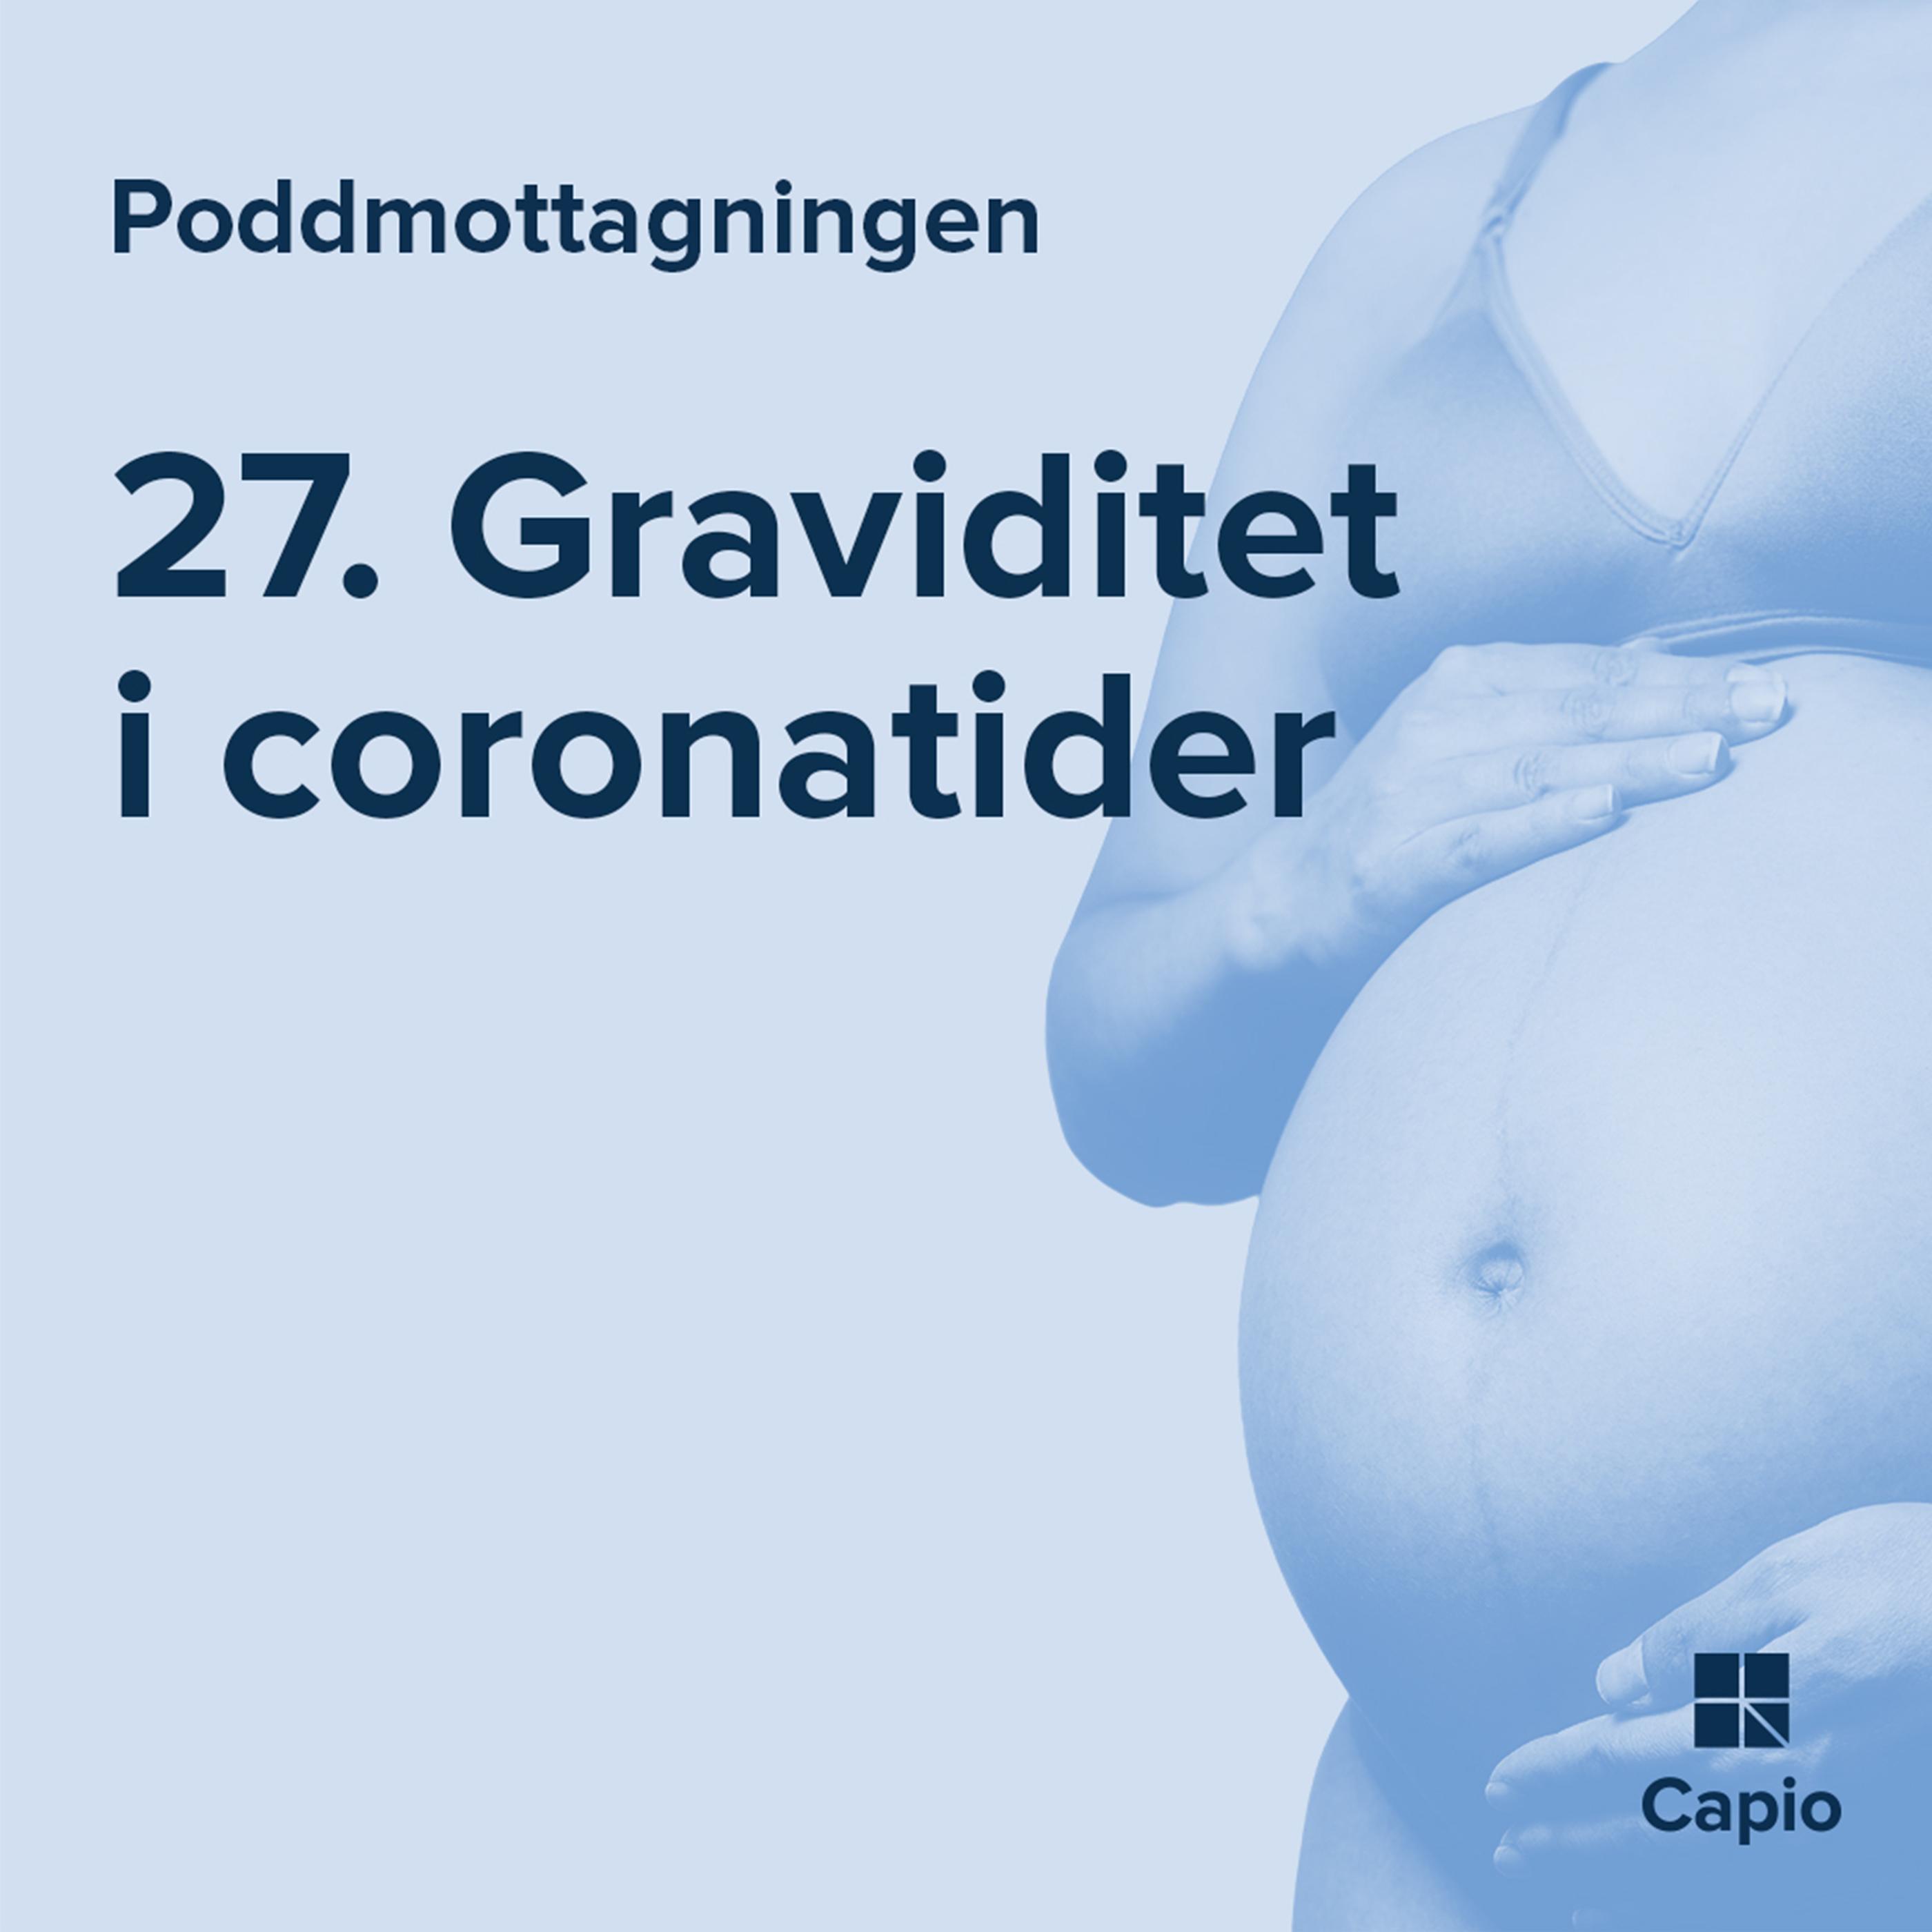 27. Graviditet i coronatider